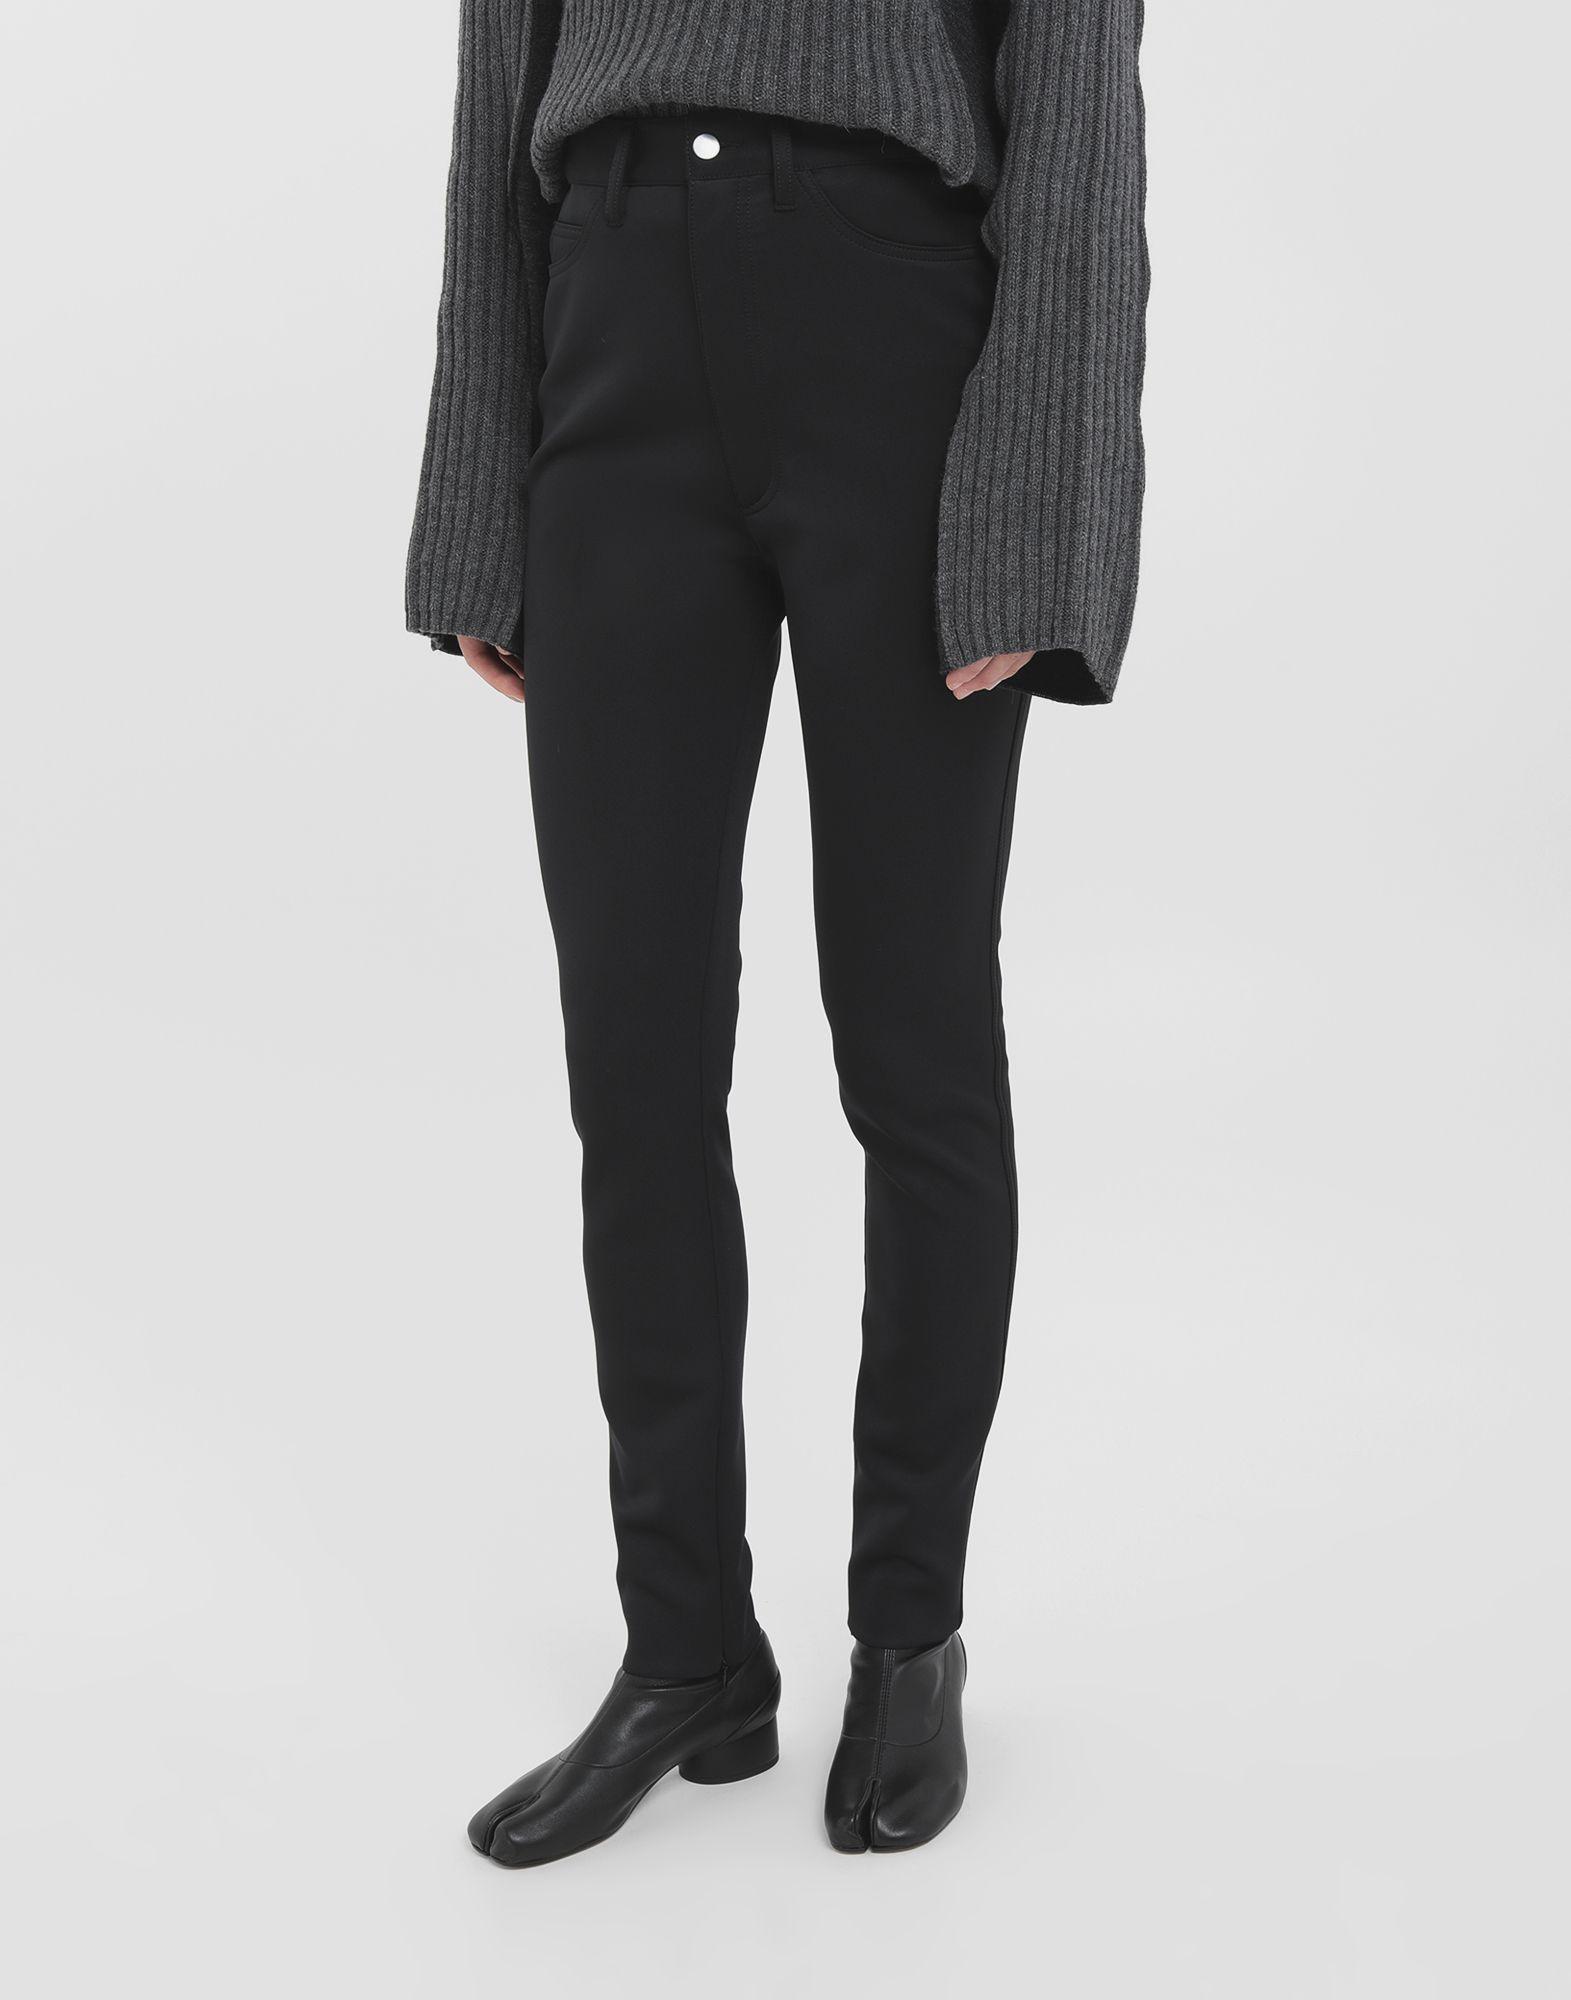 MAISON MARGIELA Skinny neoprene pants Casual pants Woman r